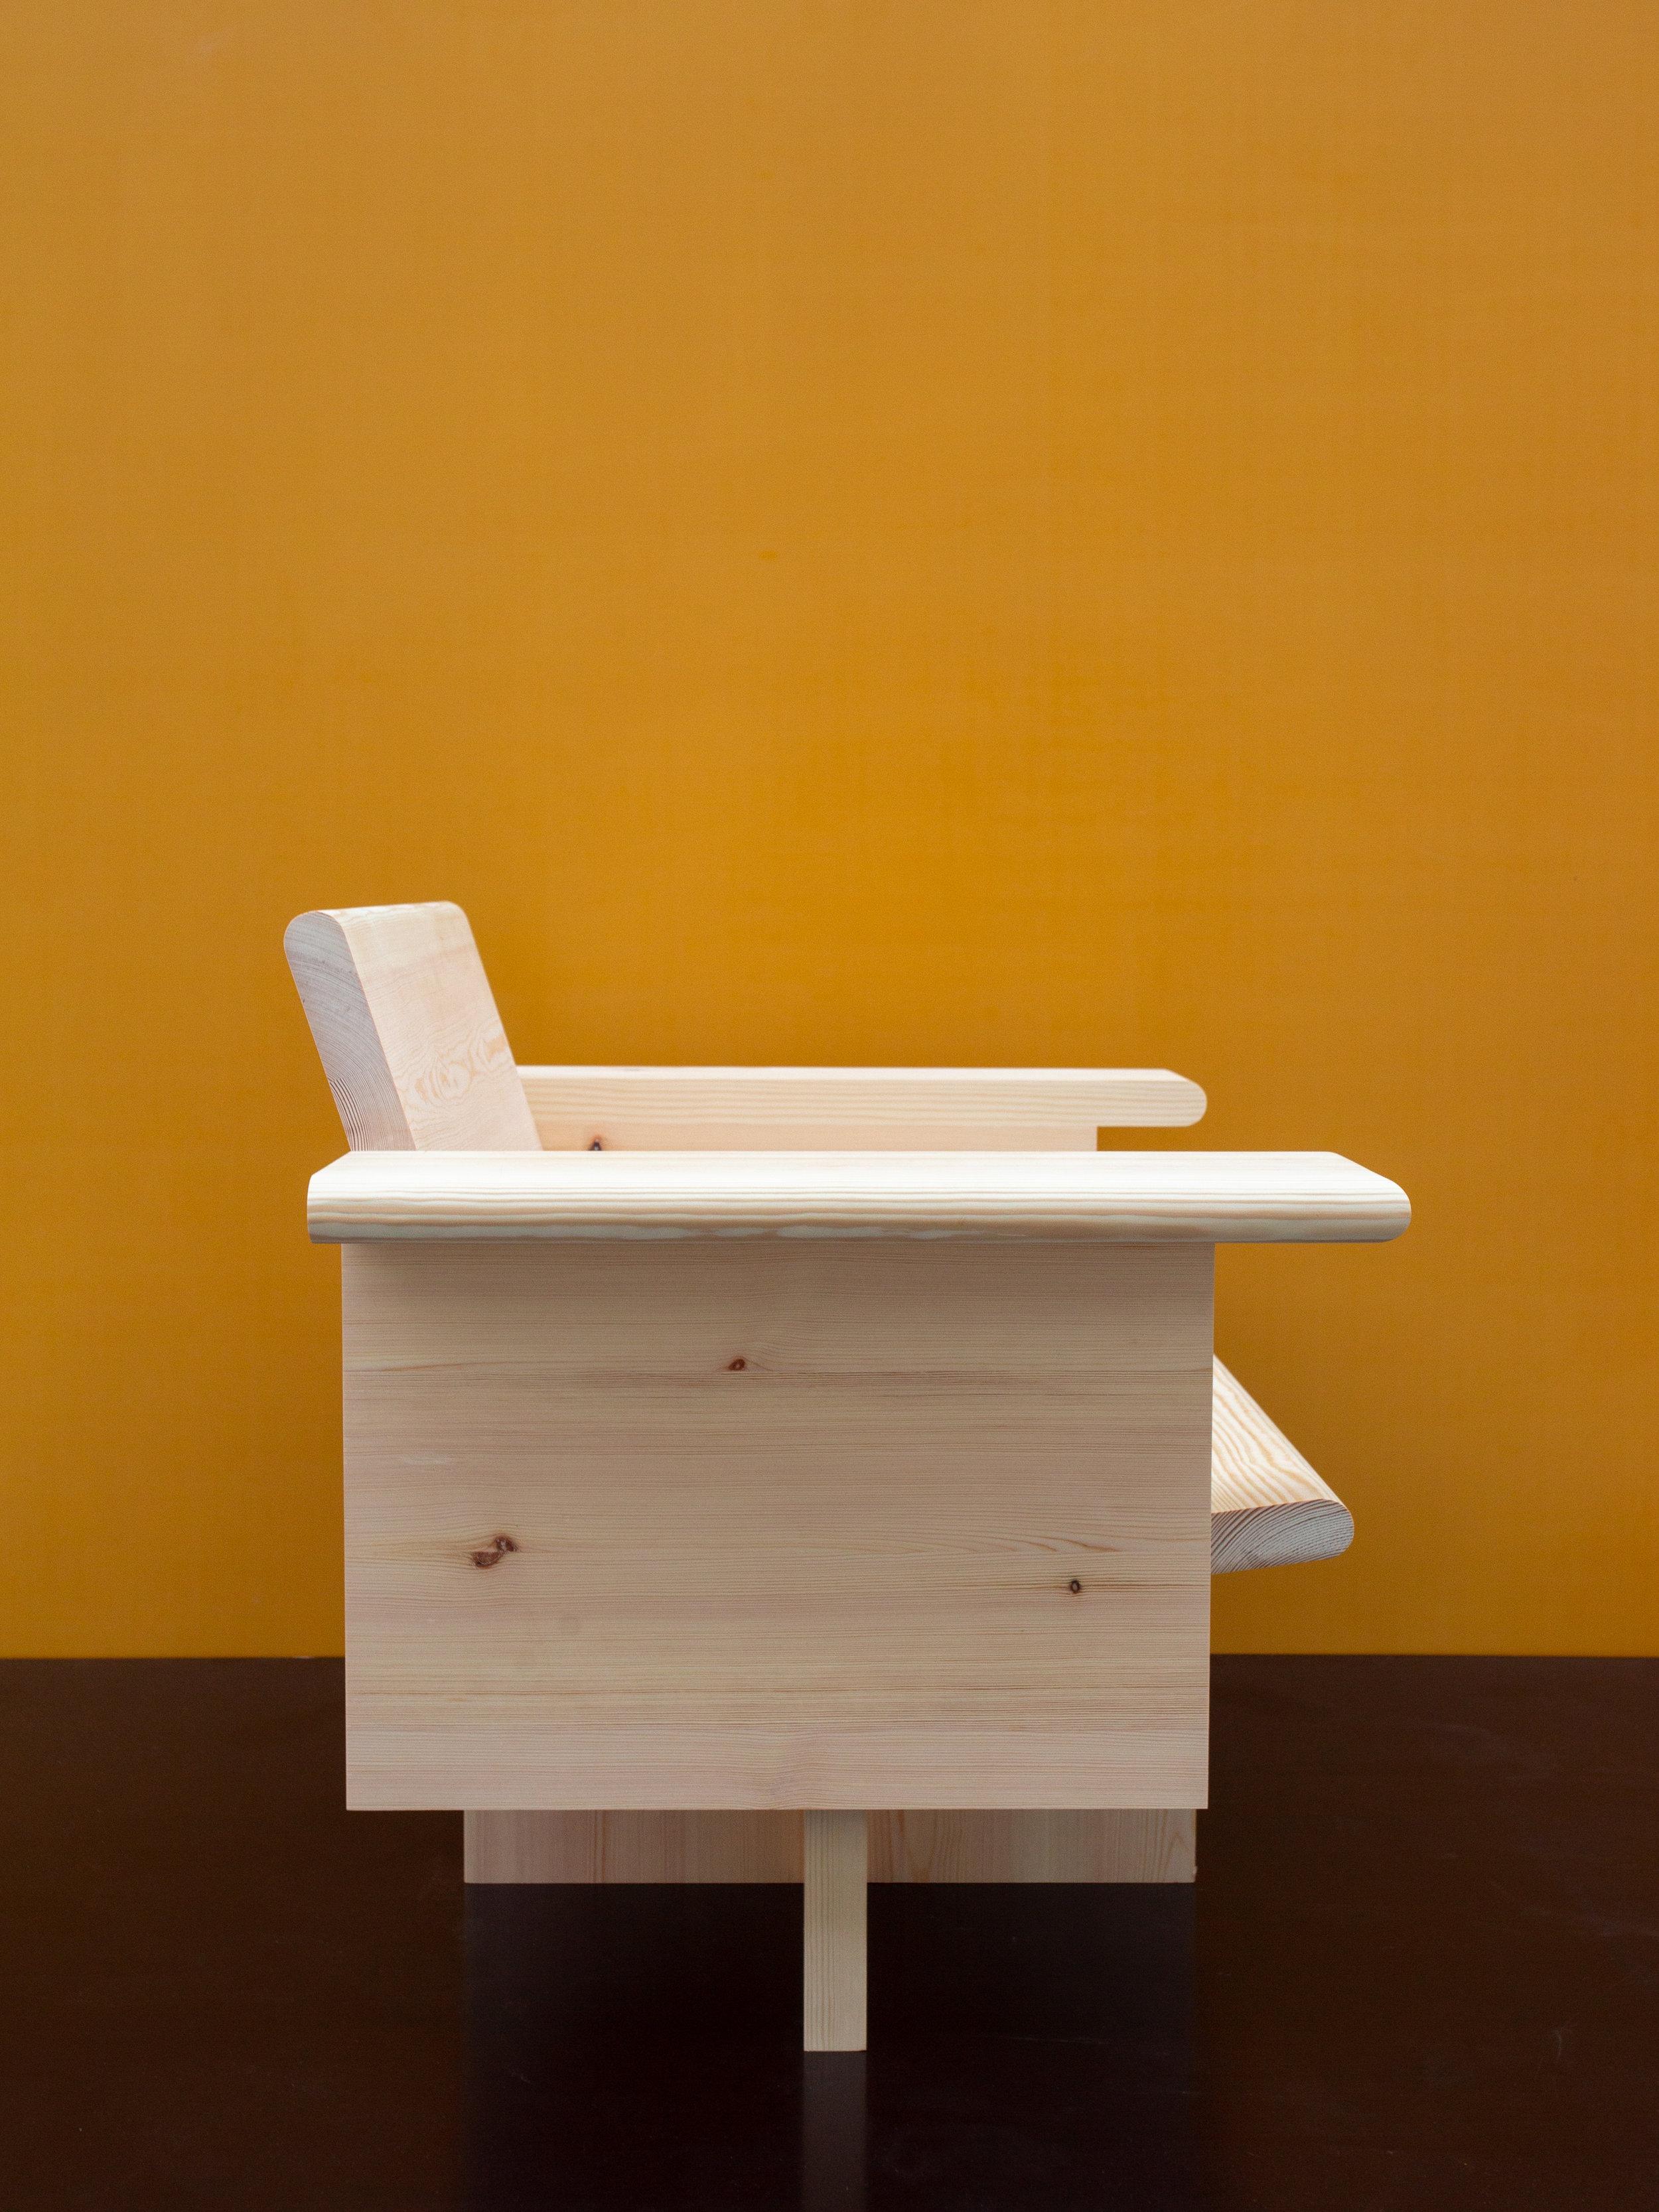 SPMA1_chairshoot_19112018-021.jpg